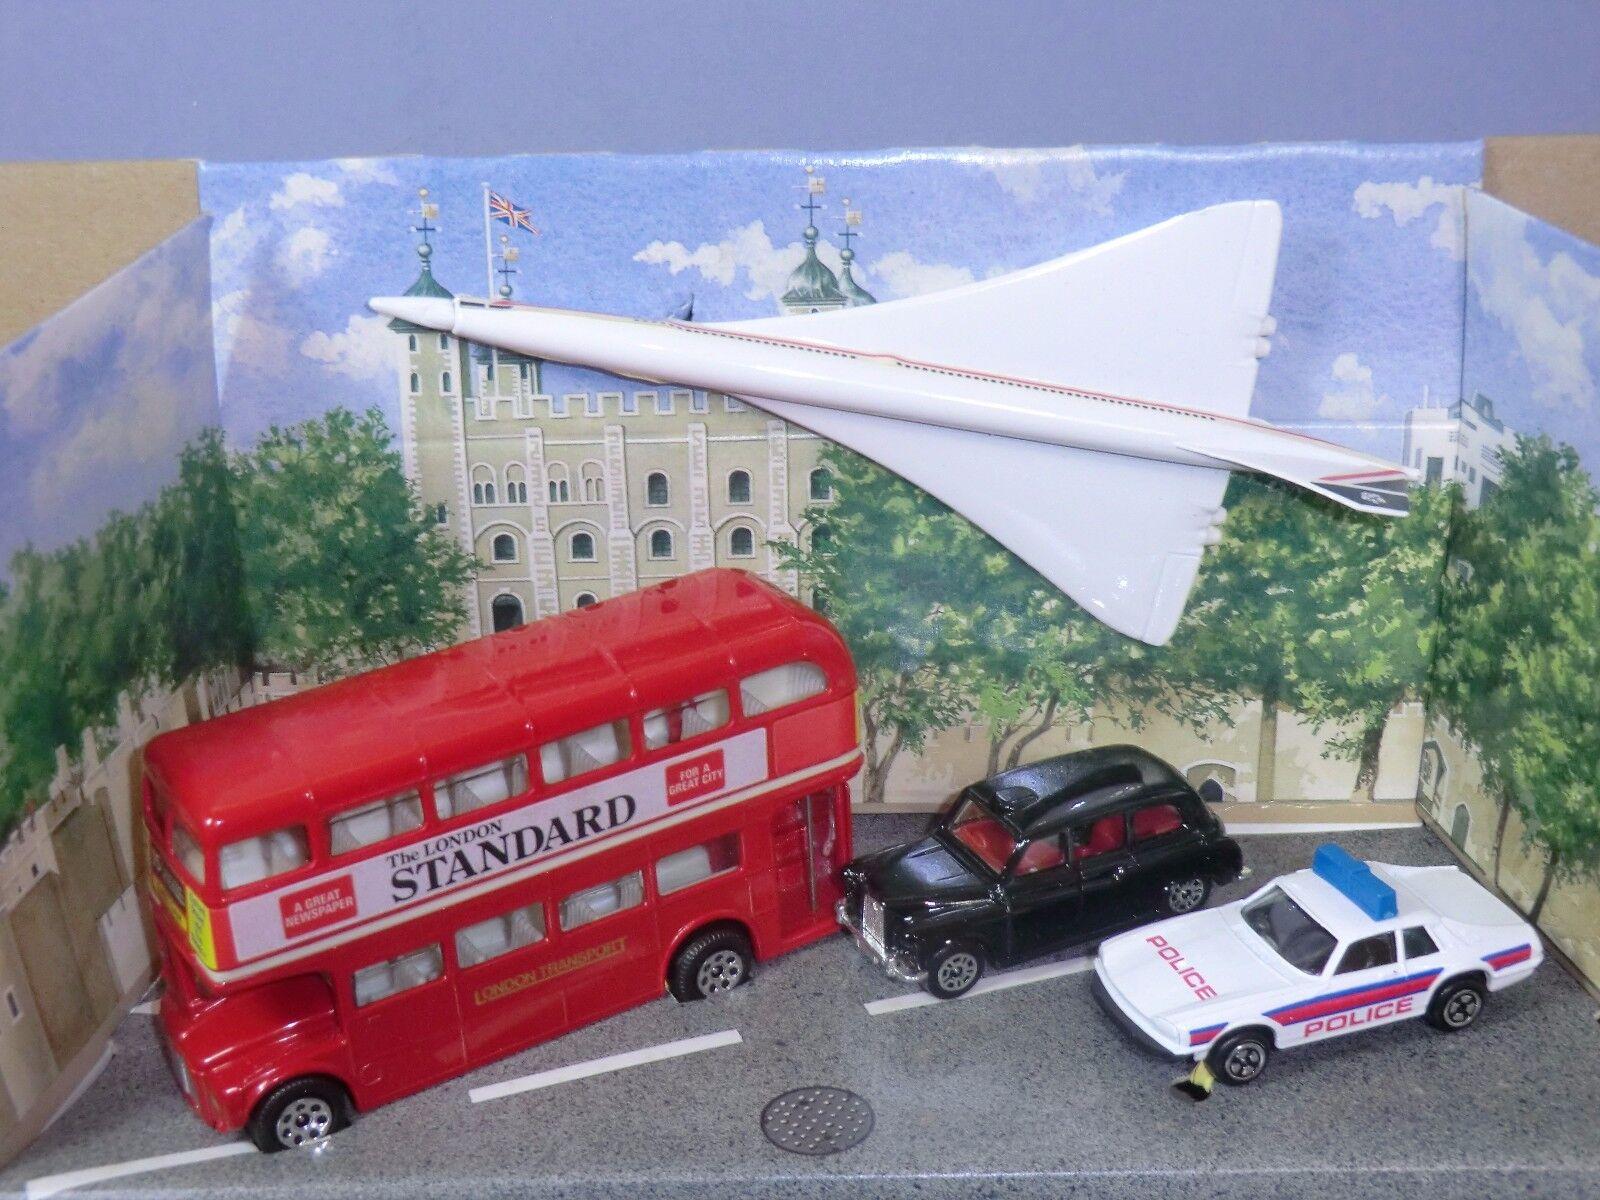 CORGI TOYS GIFT SET MODEL No.GS C34      TOWER OF LONDON            MIB